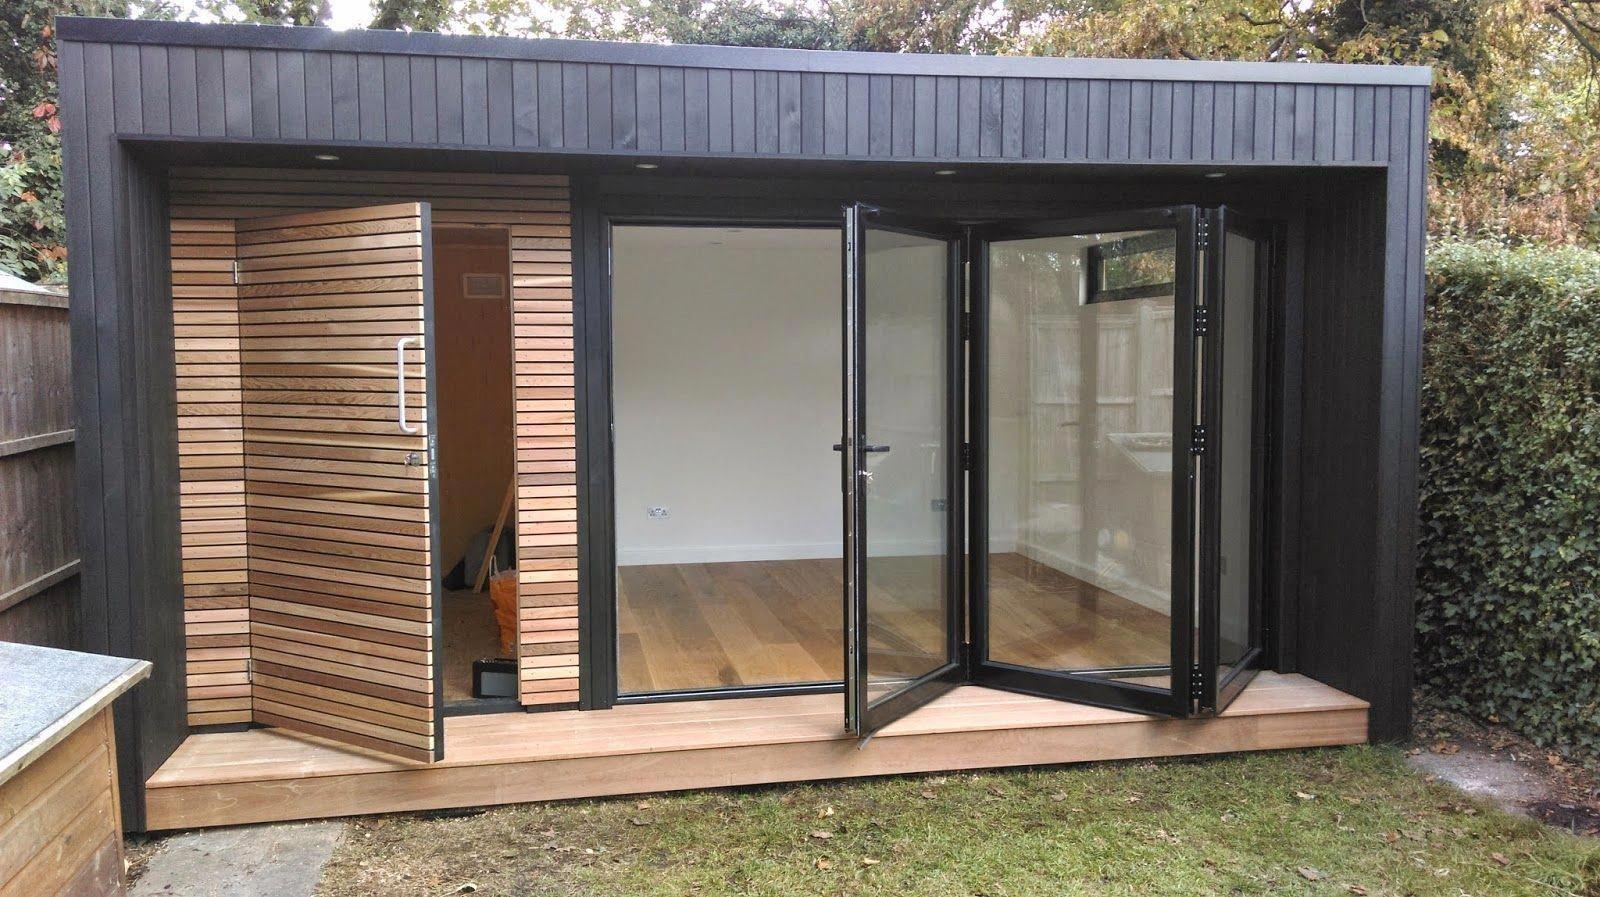 Free Decorating Diy Garden Office Plans Gardenshedplans Garden Office Shed Garden Studio Insulated Garden Room